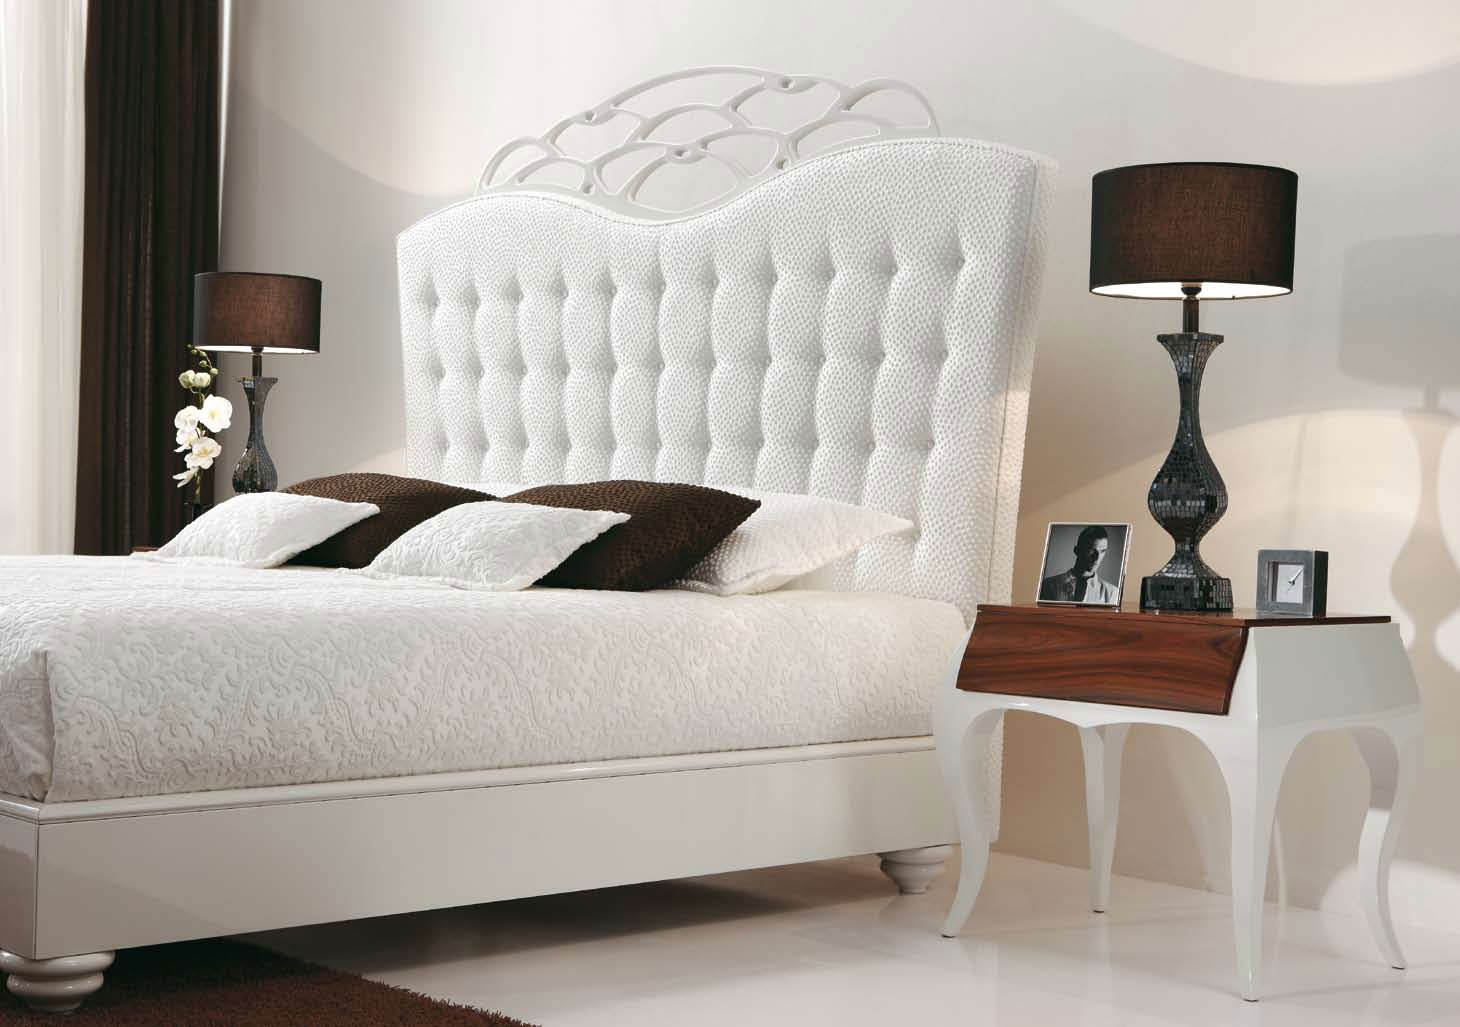 17 Best images about Bedroom on Pinterest Bedroom ideas Bedroom designs and  Master bedroom design. Good Bed Designs